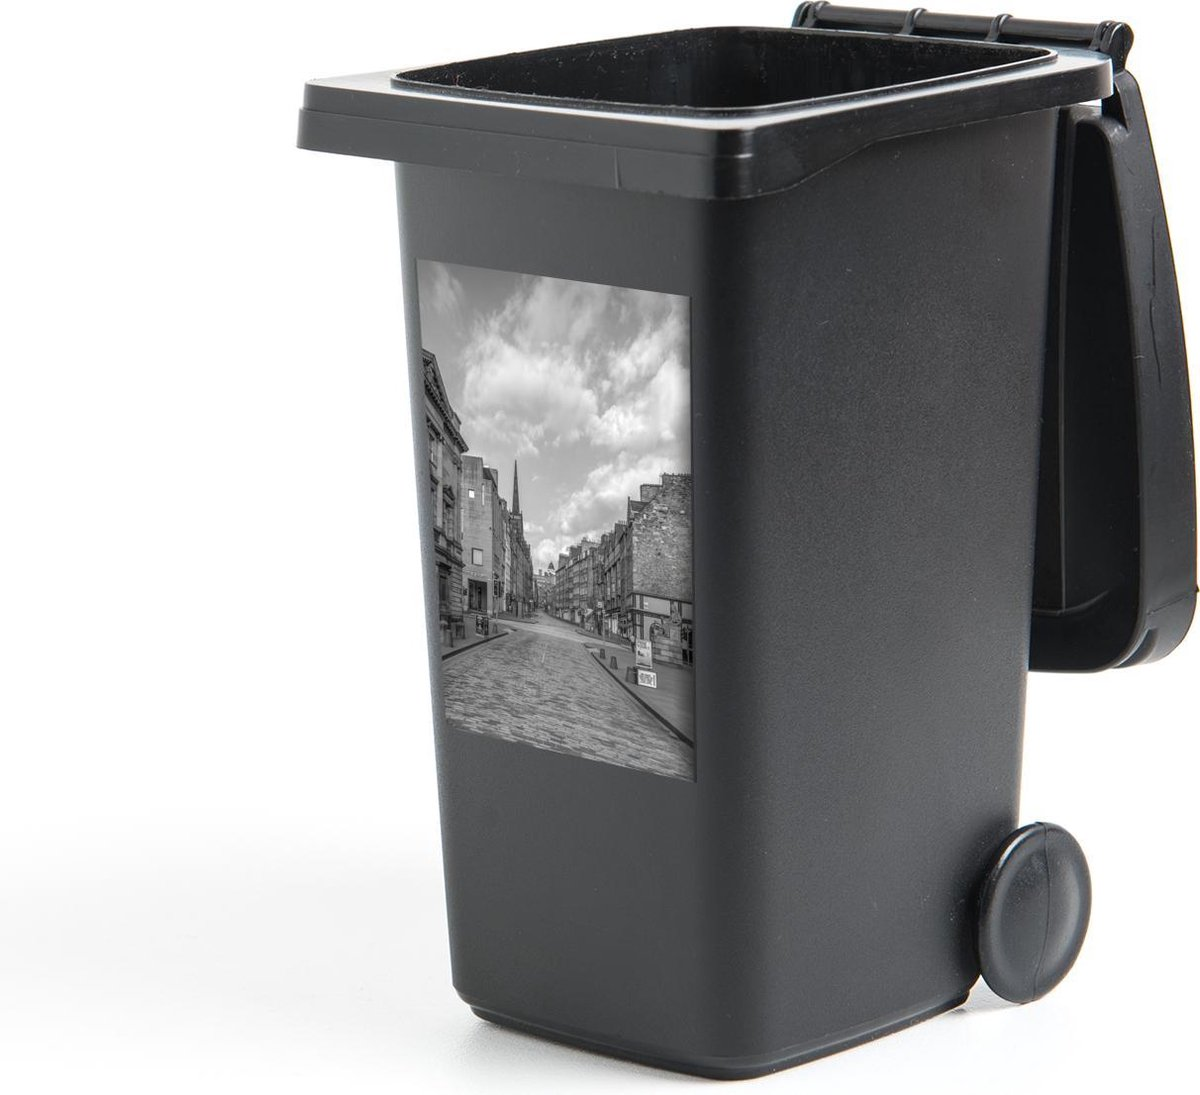 Container sticker De straten van de Royal Mile bij daglicht - zwart wit - 40x60 cm - Kliko sticker